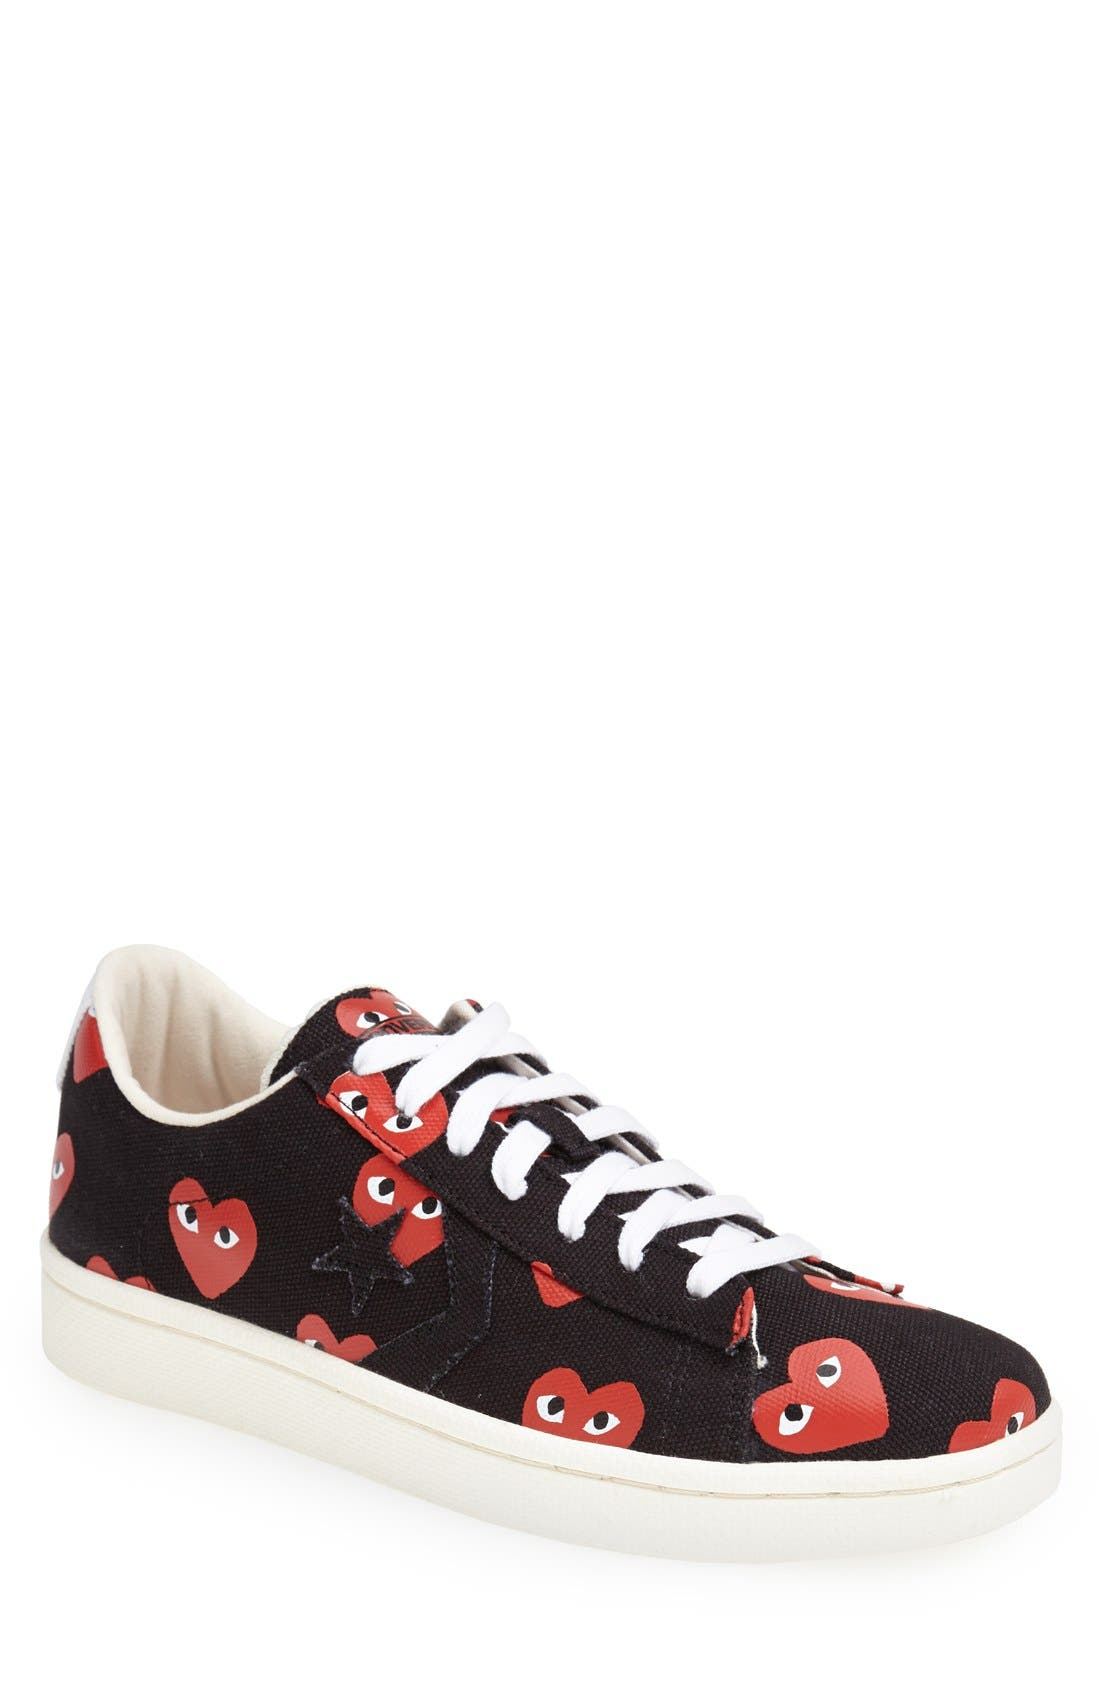 PLAY x Converse Chuck Taylor<sup>®</sup> Low Top Sneaker,                             Main thumbnail 1, color,                             001